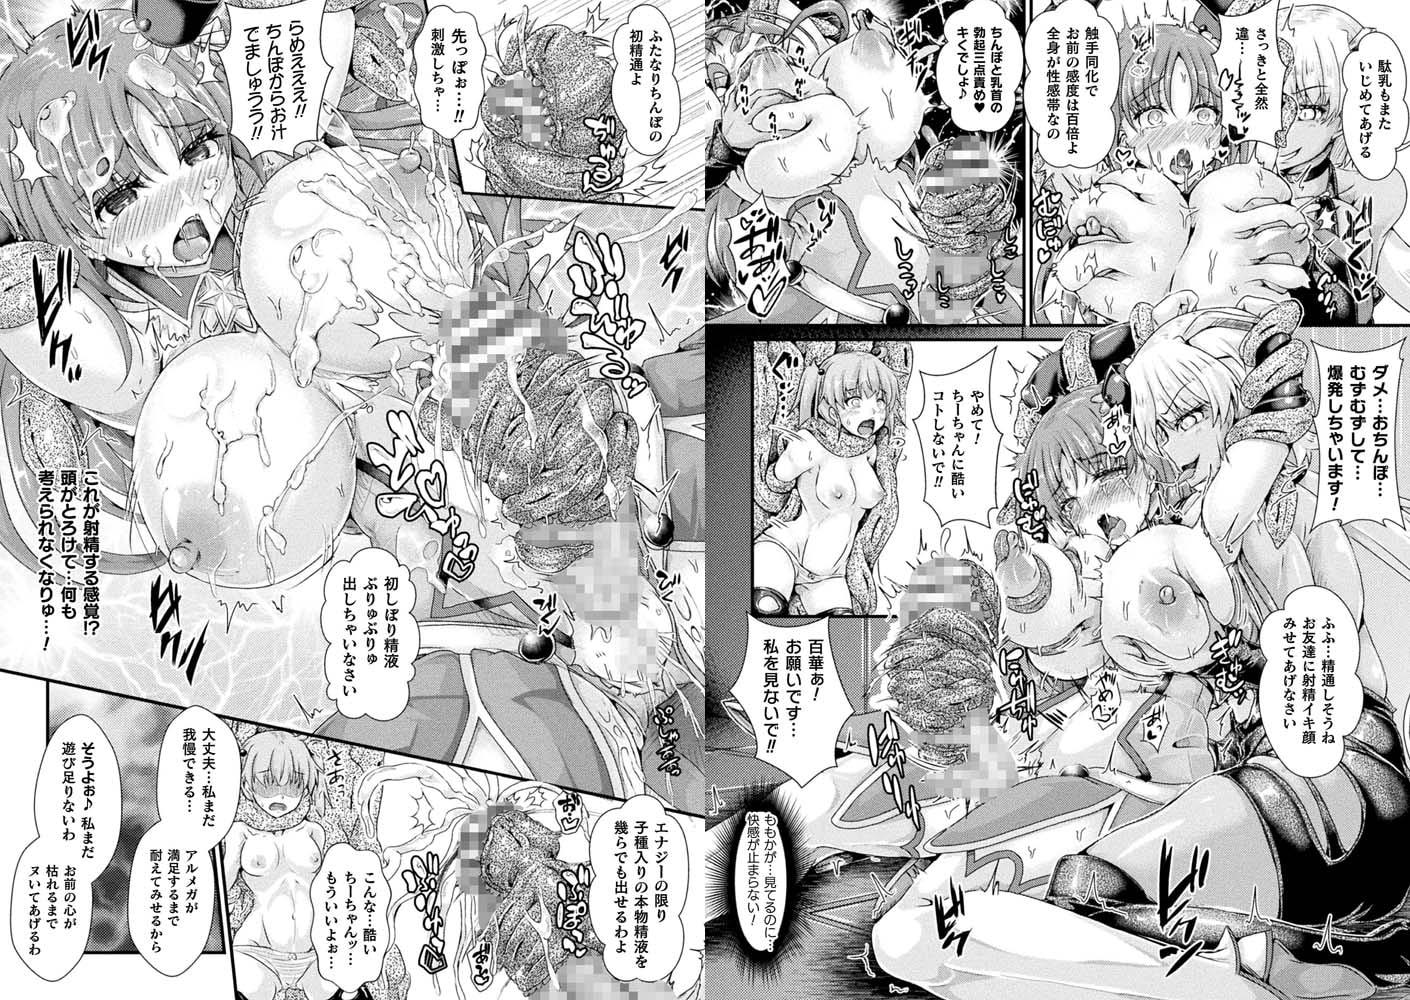 Corrupted Maiden ~淫欲に堕ちる戦姫たち~【電子書籍限定版】